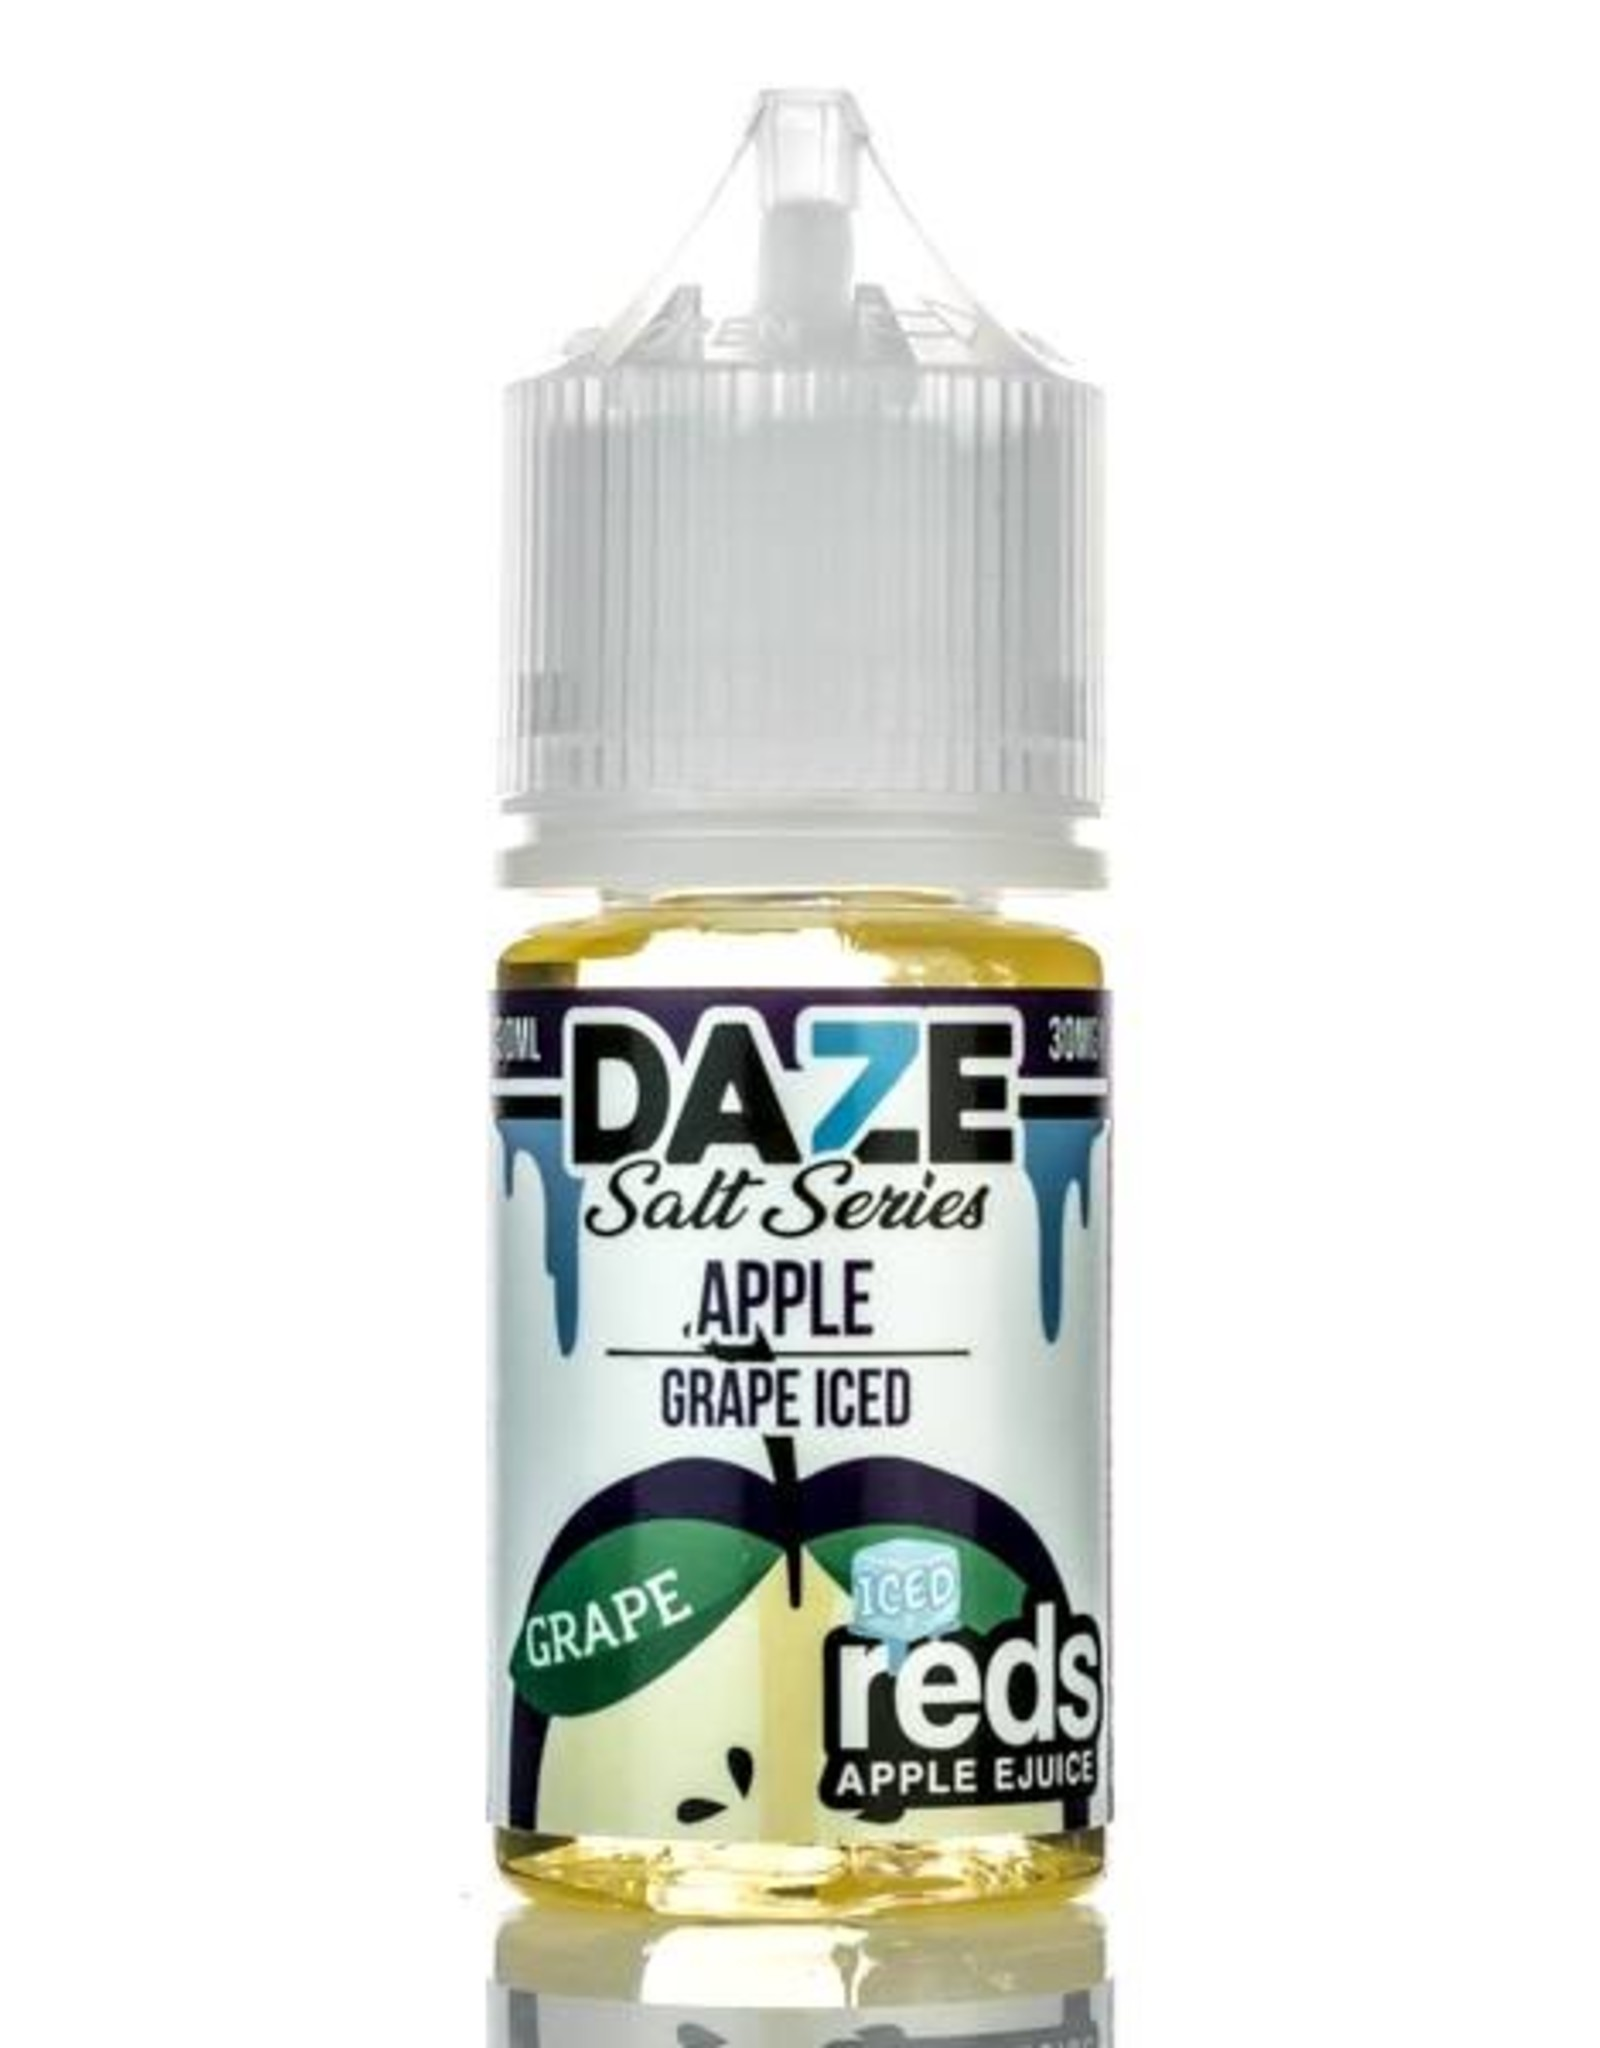 7 Daze - Salt Series Apple *Grape* Iced (30mL)